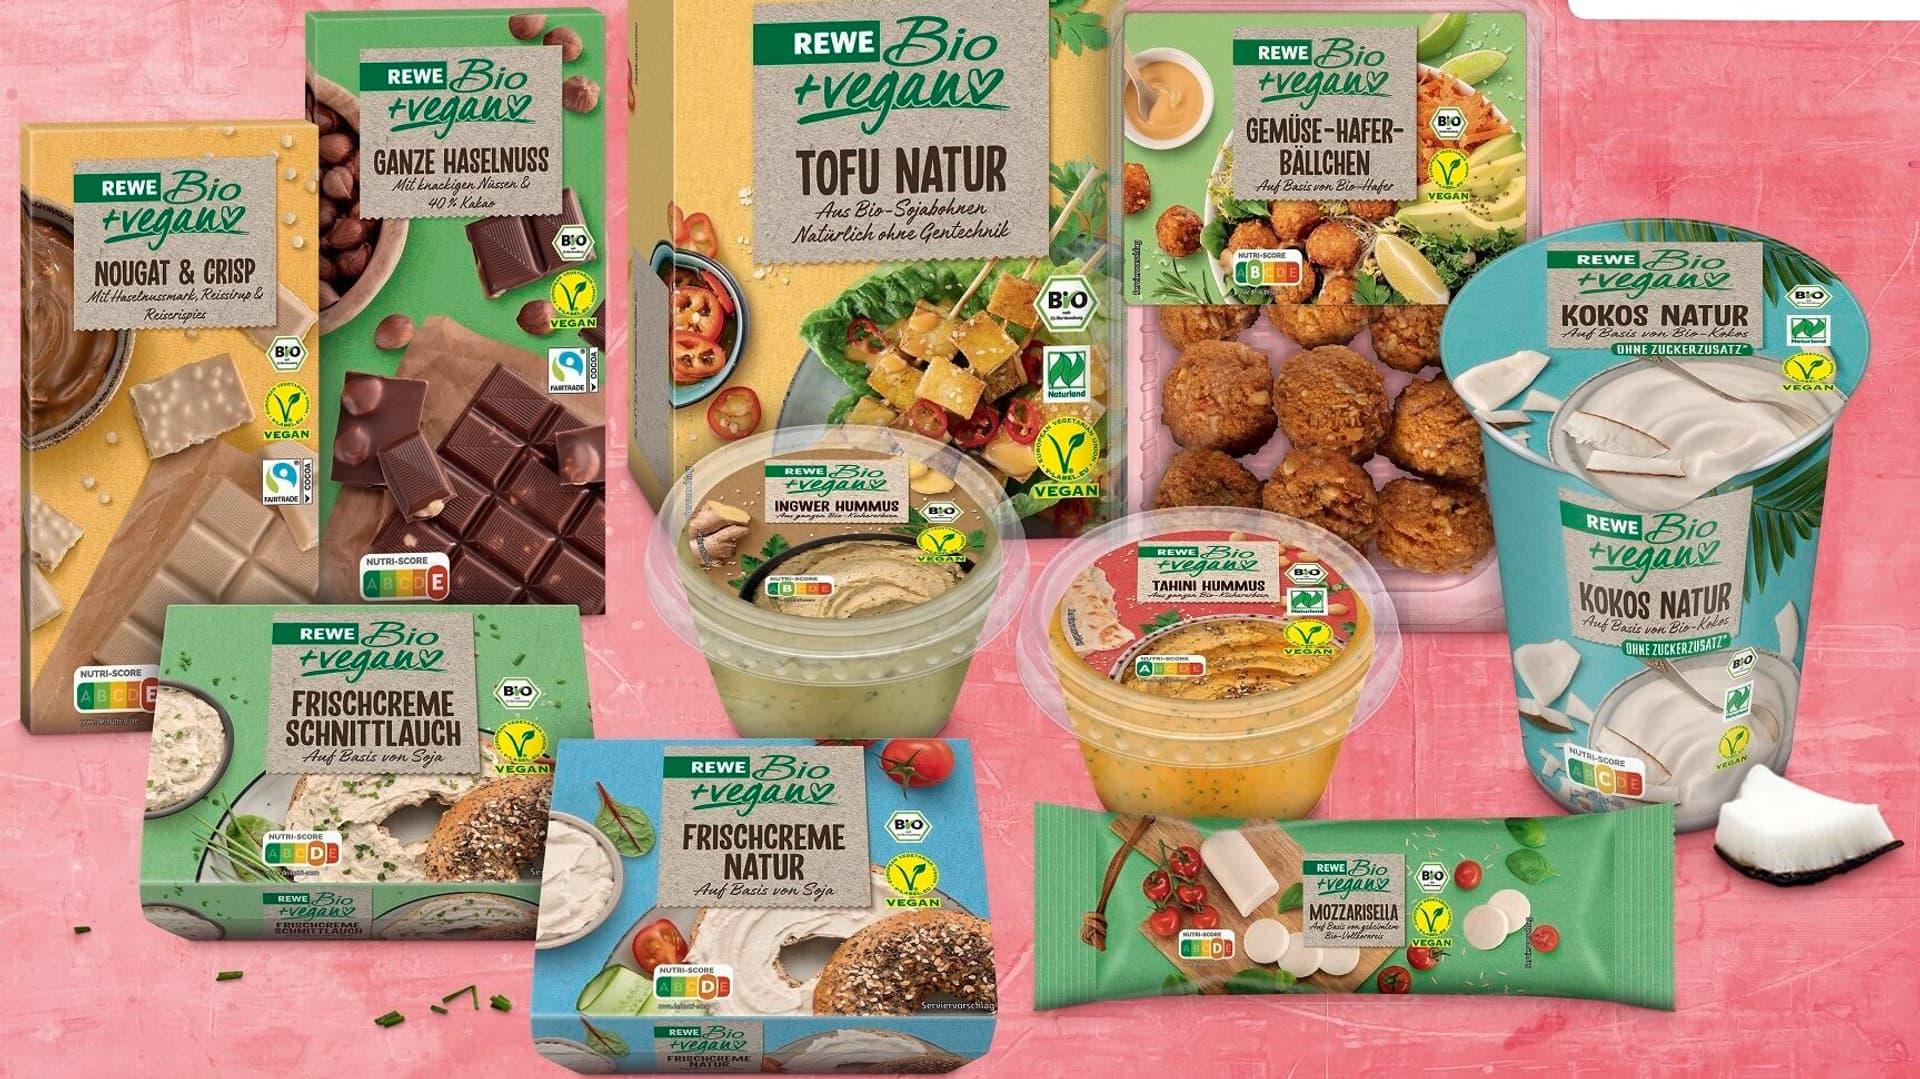 Rewe Bio + Vegan